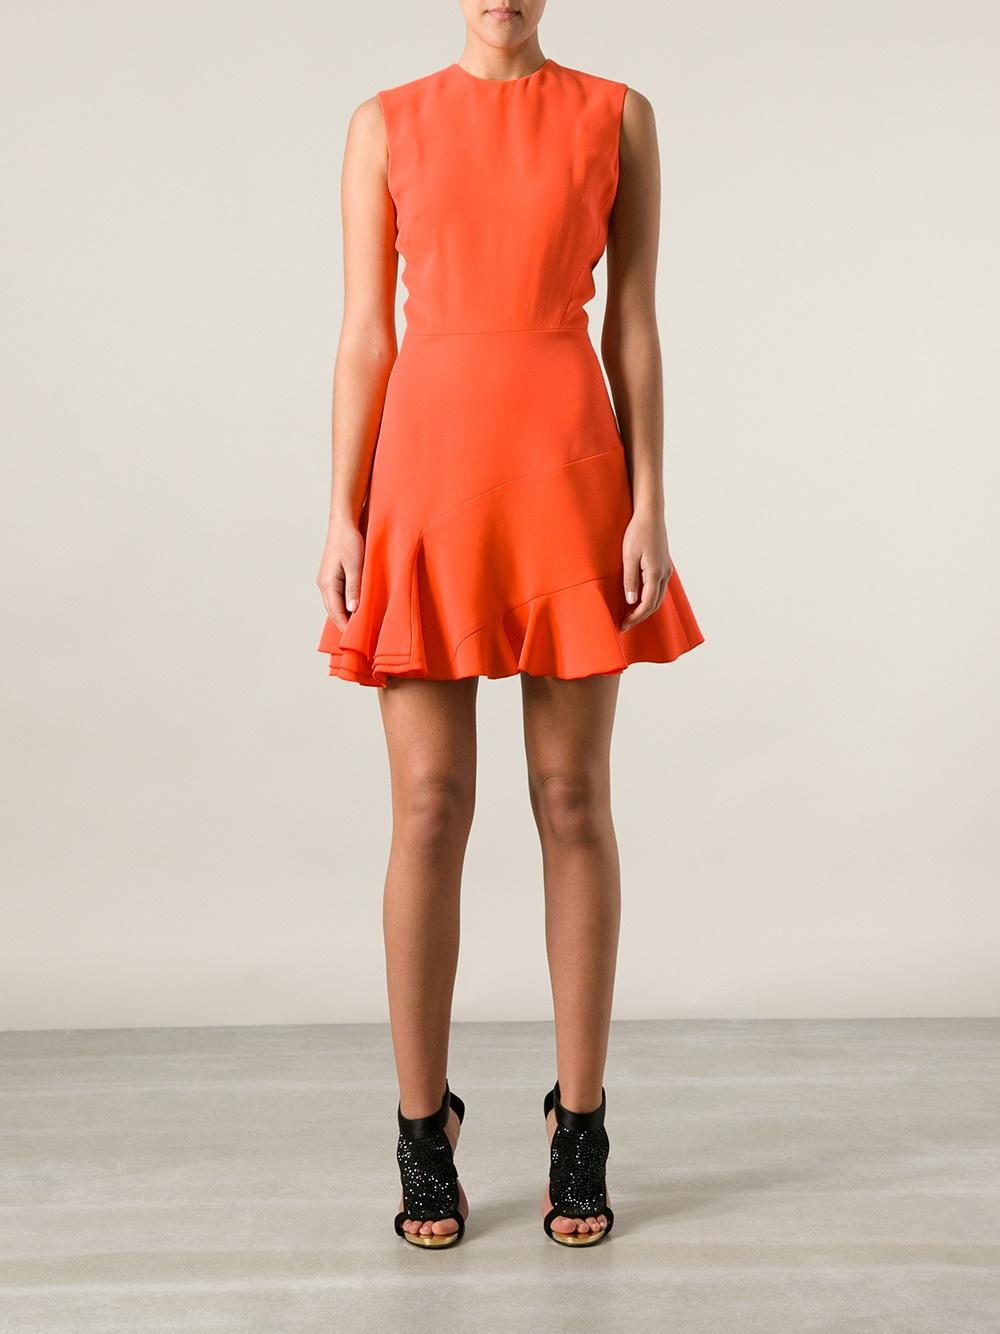 Victoria Beckham Short Dresses